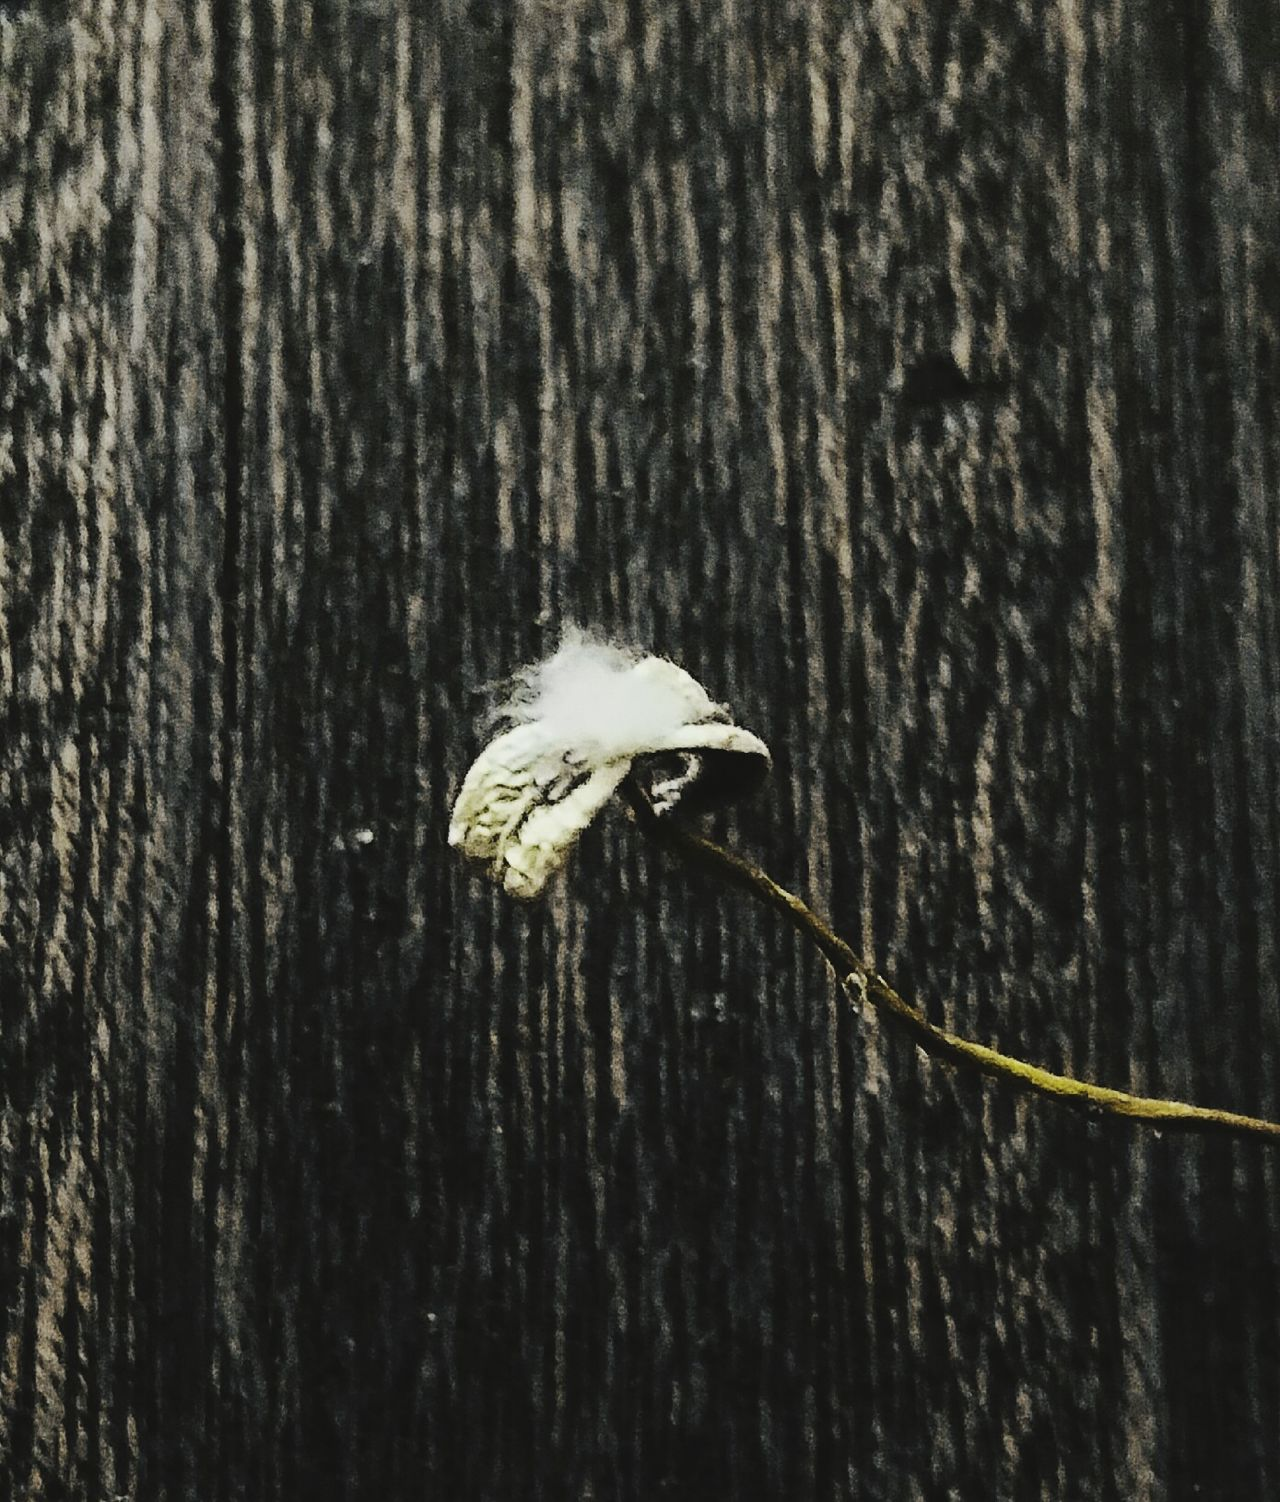 Cottonwood Cottonwood Trees Leaves_collection Wood Grain Beauty Fine Art